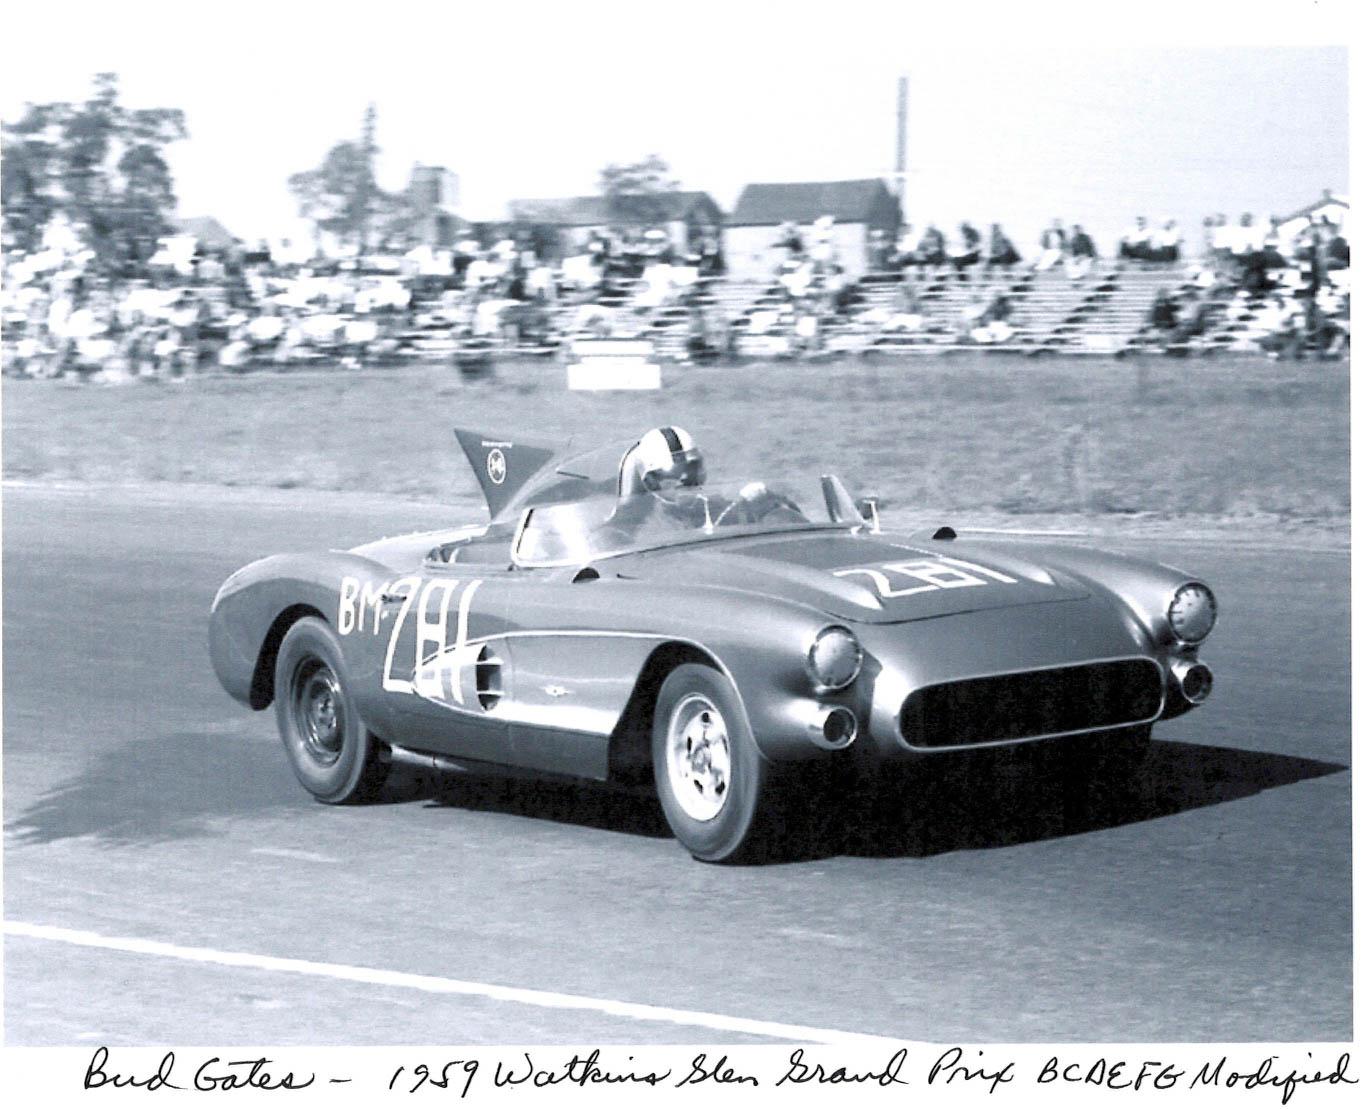 historic shot of the 1956 SR-2 racing